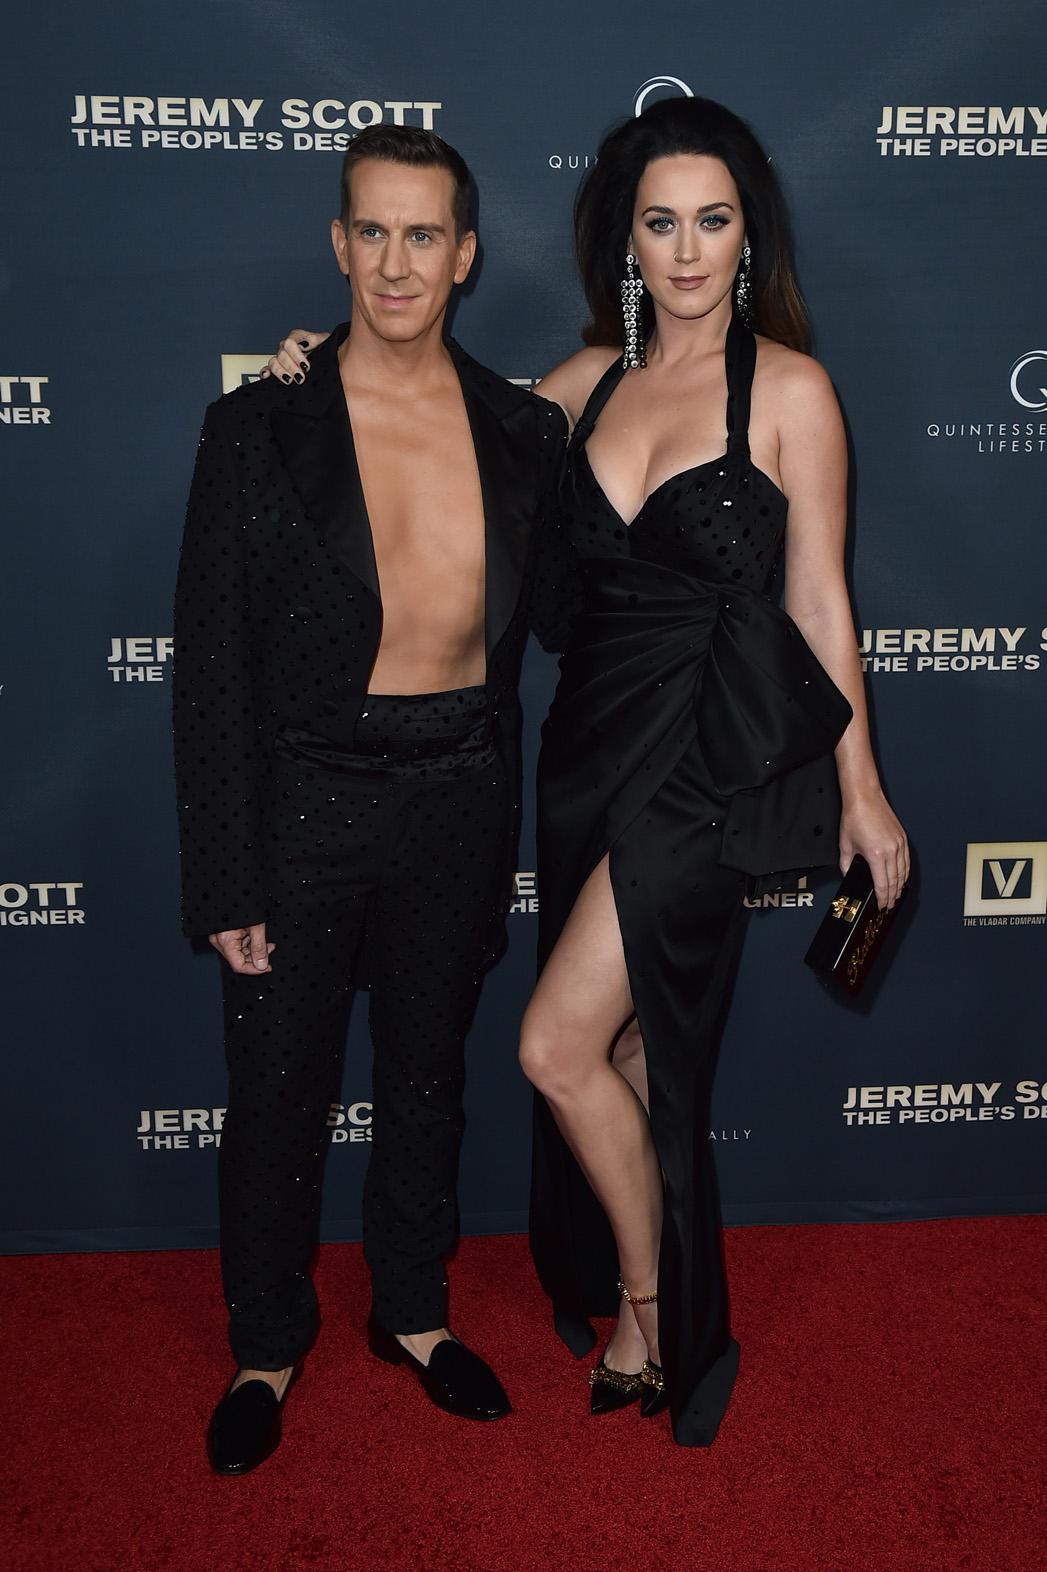 Jeremy Scott and Katy Perry - P 2015